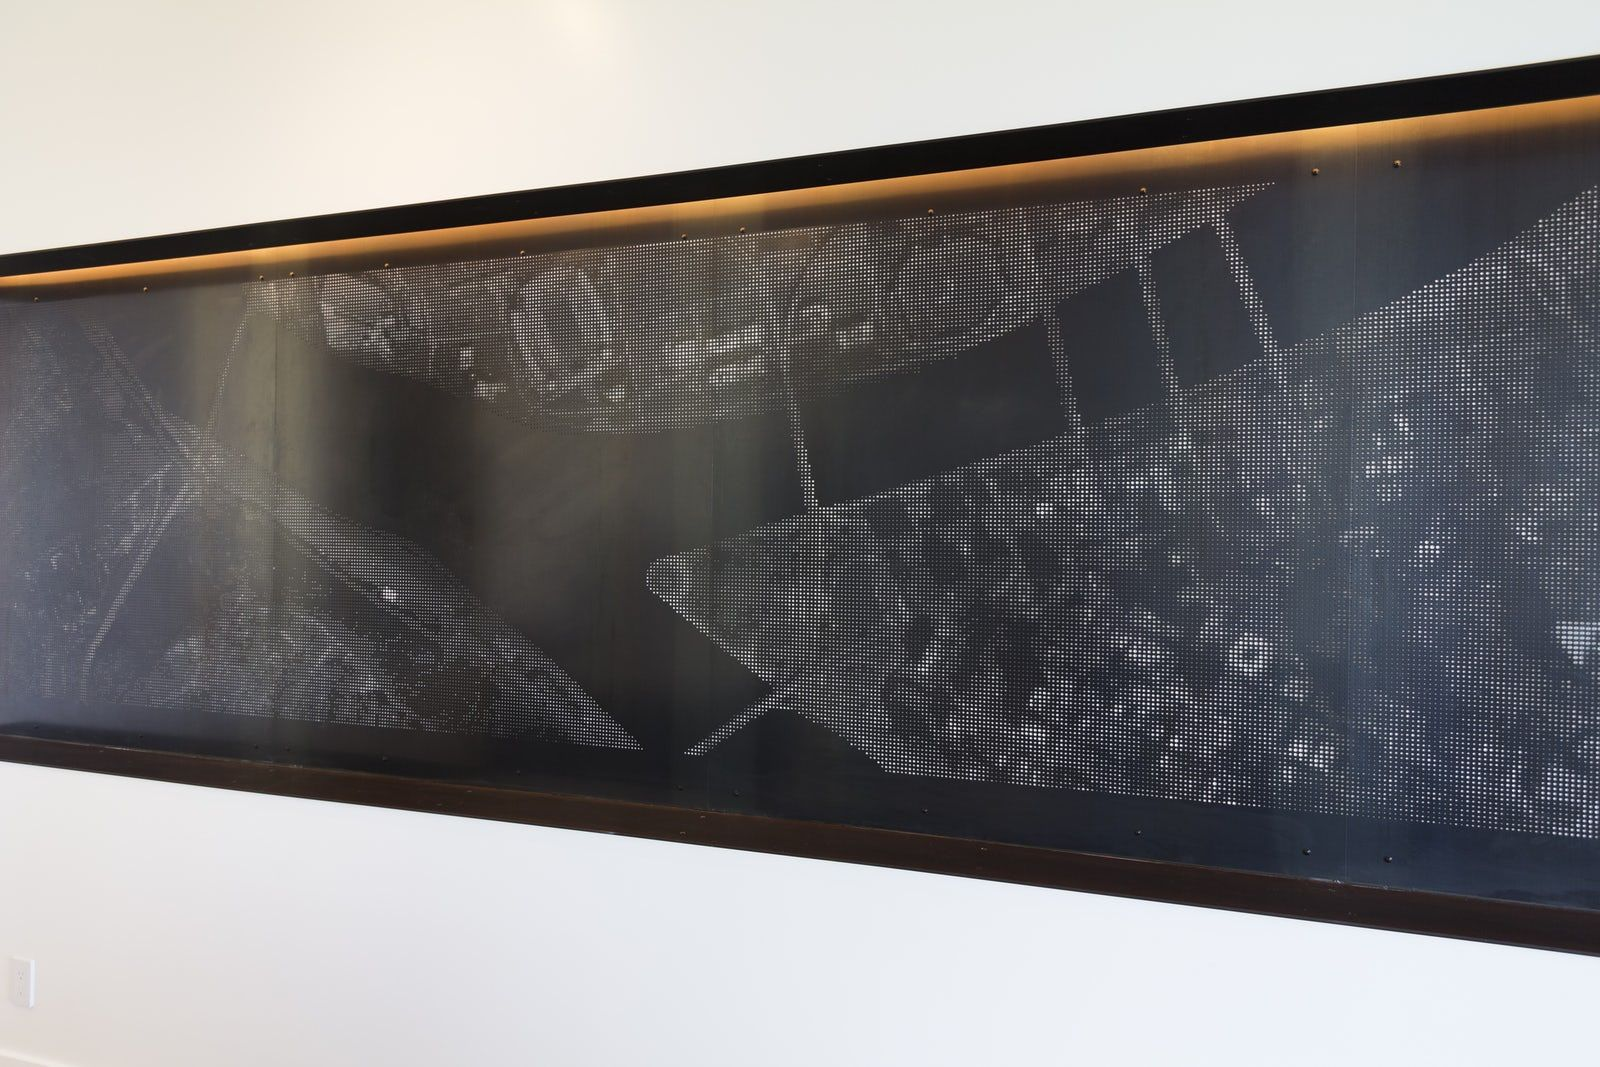 Image wall printed map in perforated metal environmental